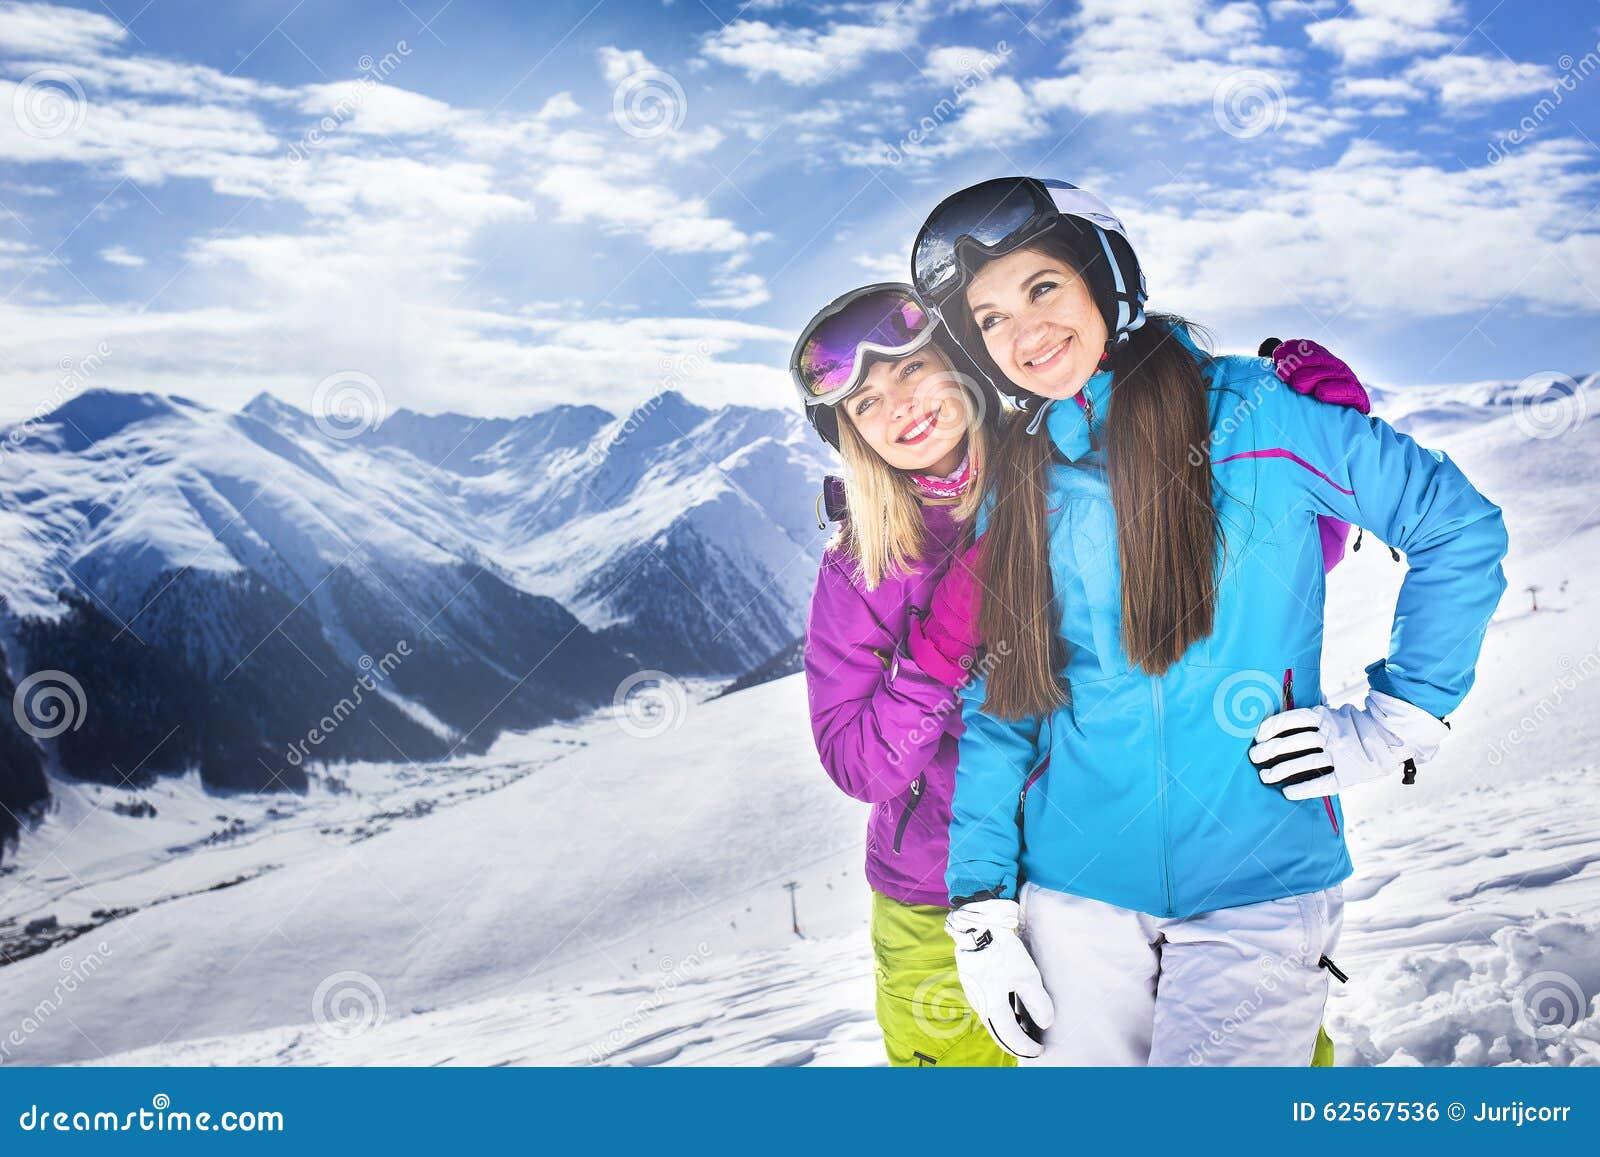 Two Girls Hugging In Winter Ski Resort Blue Sky Stock Photo - Image ... 961cc407d